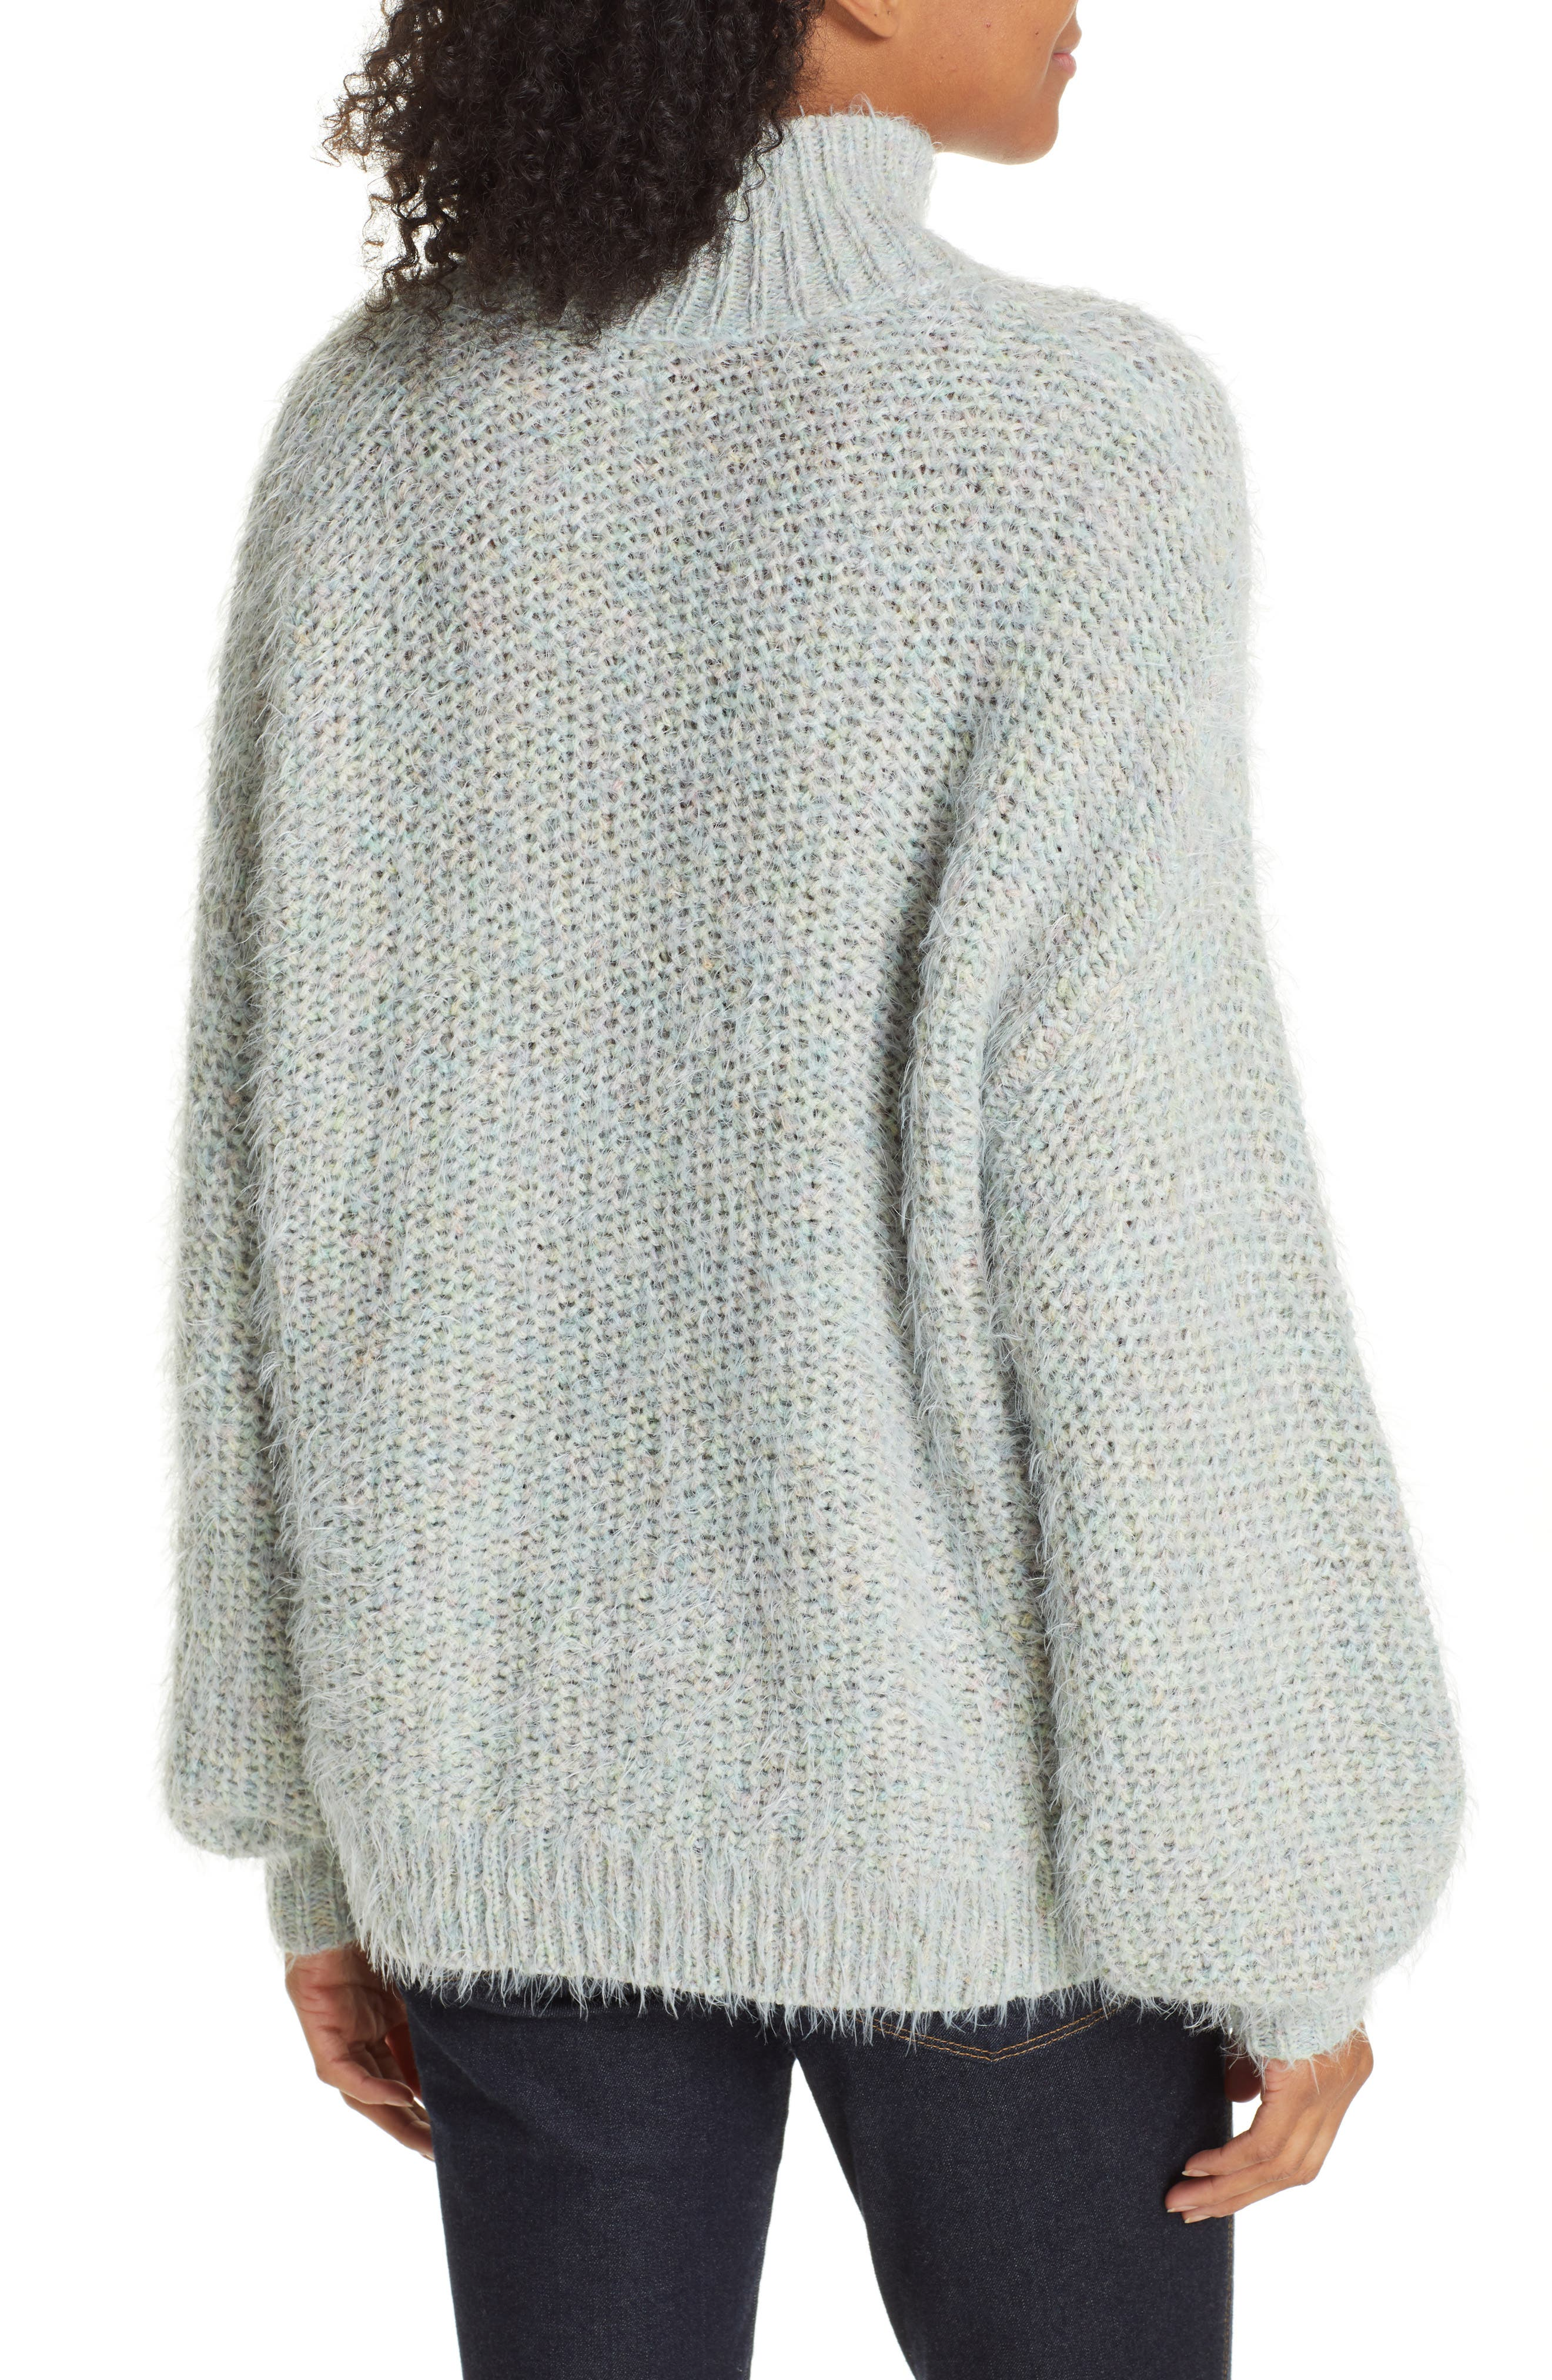 Markita Sweater,                             Alternate thumbnail 2, color,                             HEATHER CELADON